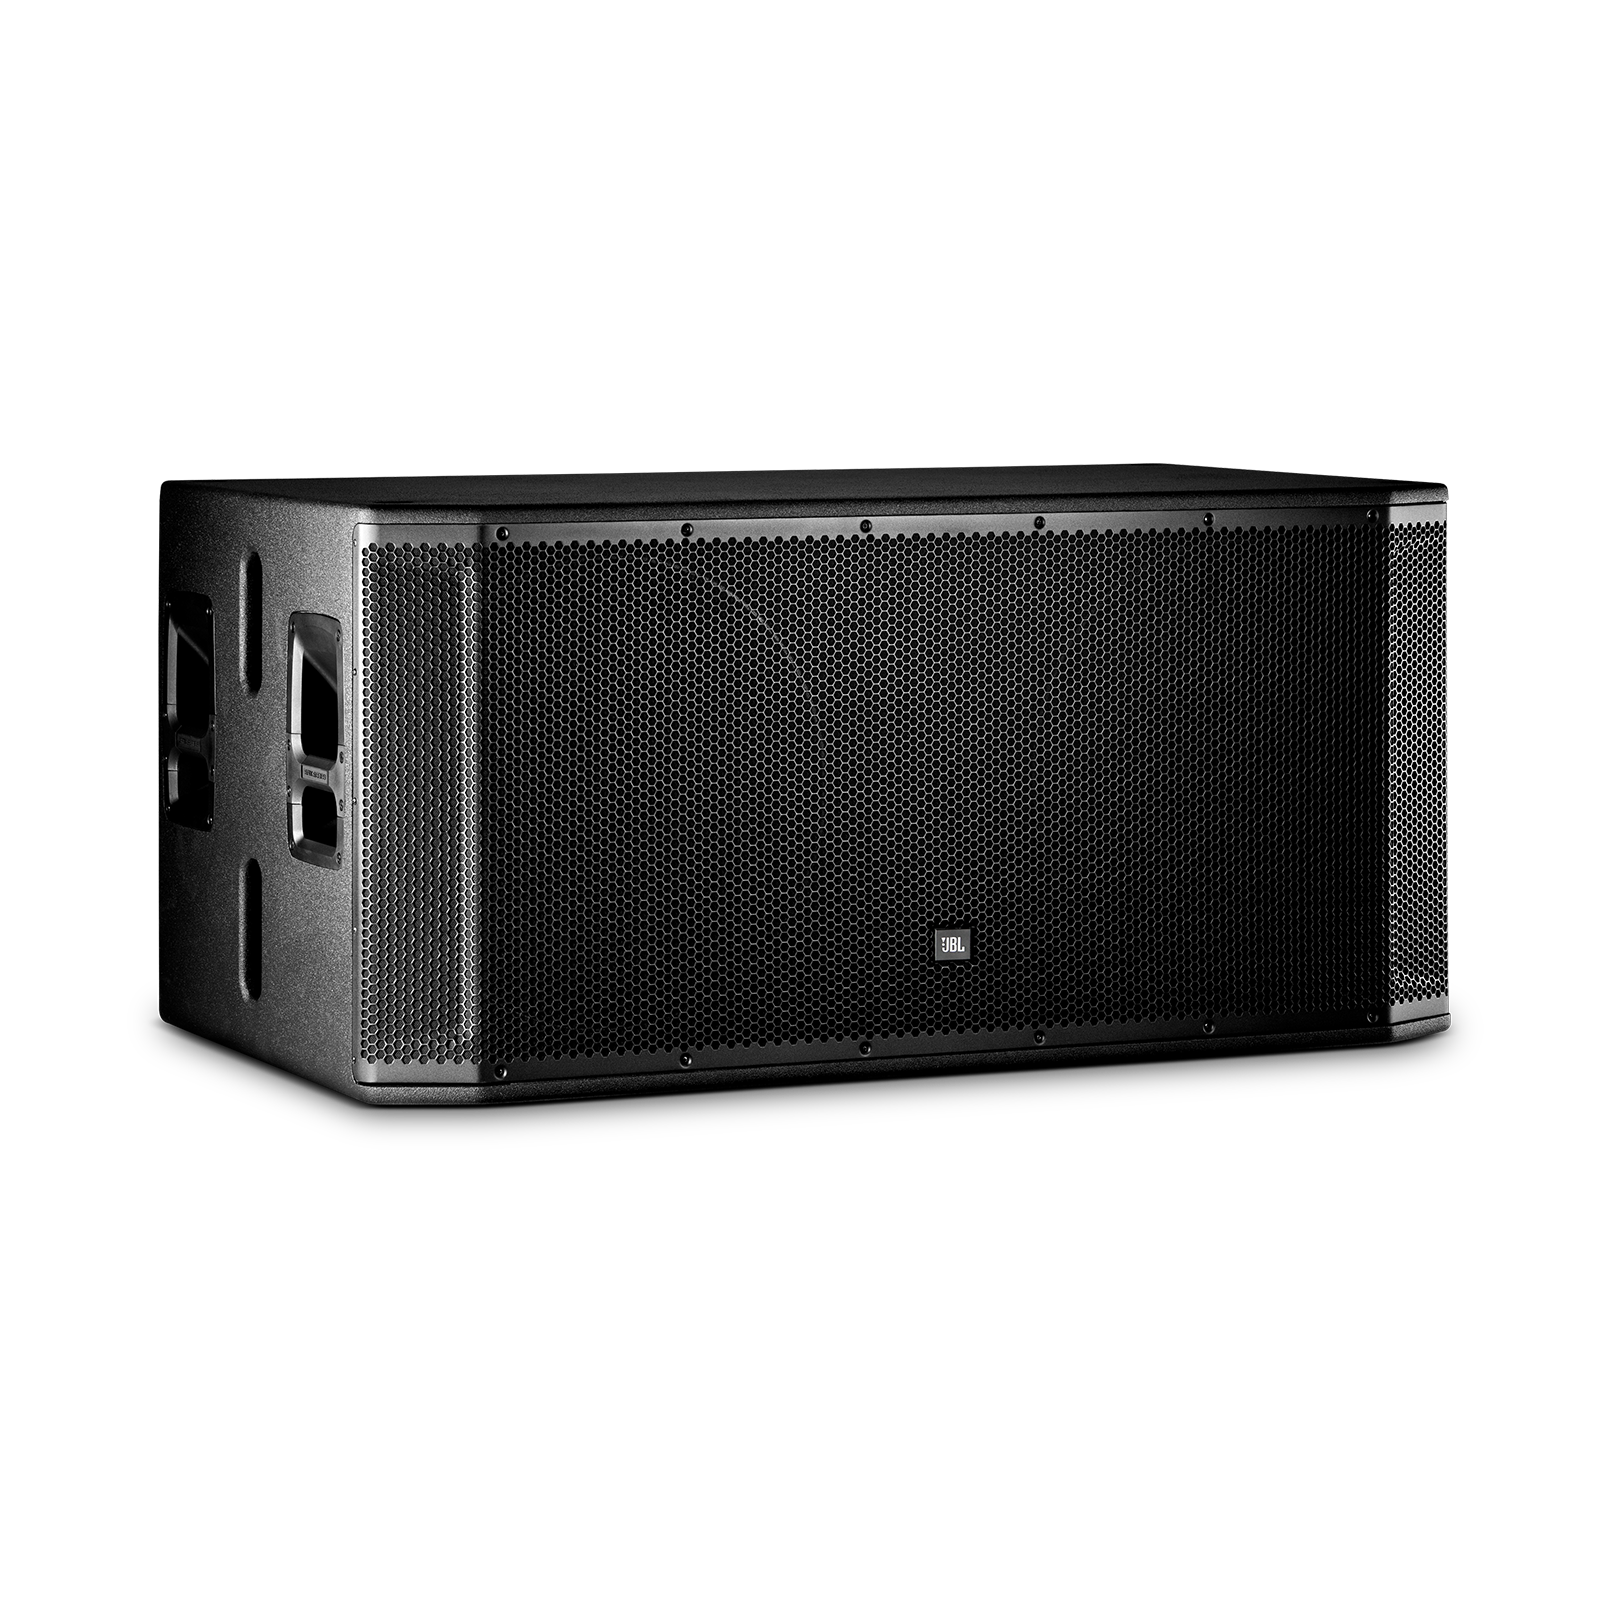 "JBL SRX828SP - Black - 18"" Dual Self-Powered Subwoofer System - Hero"